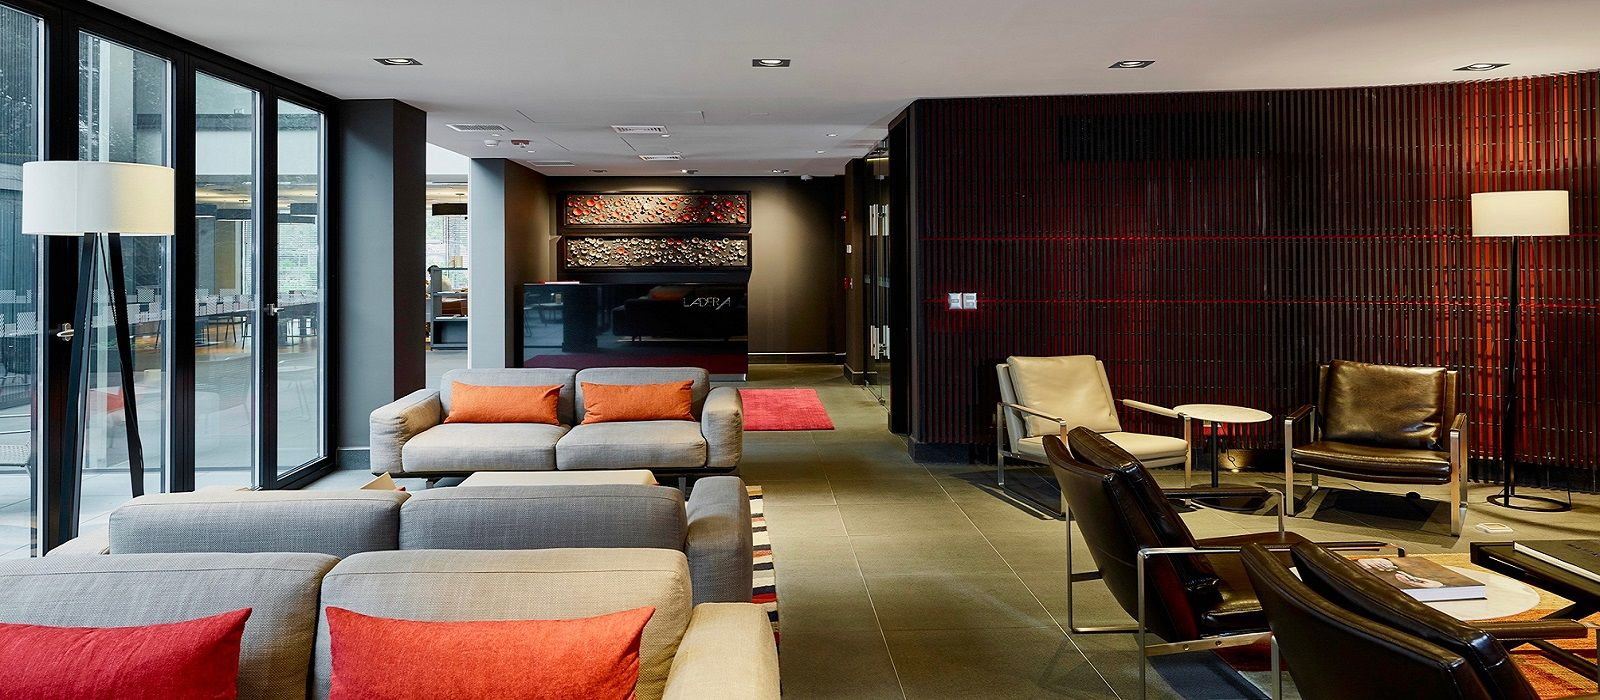 Hotel Ladera  Chile